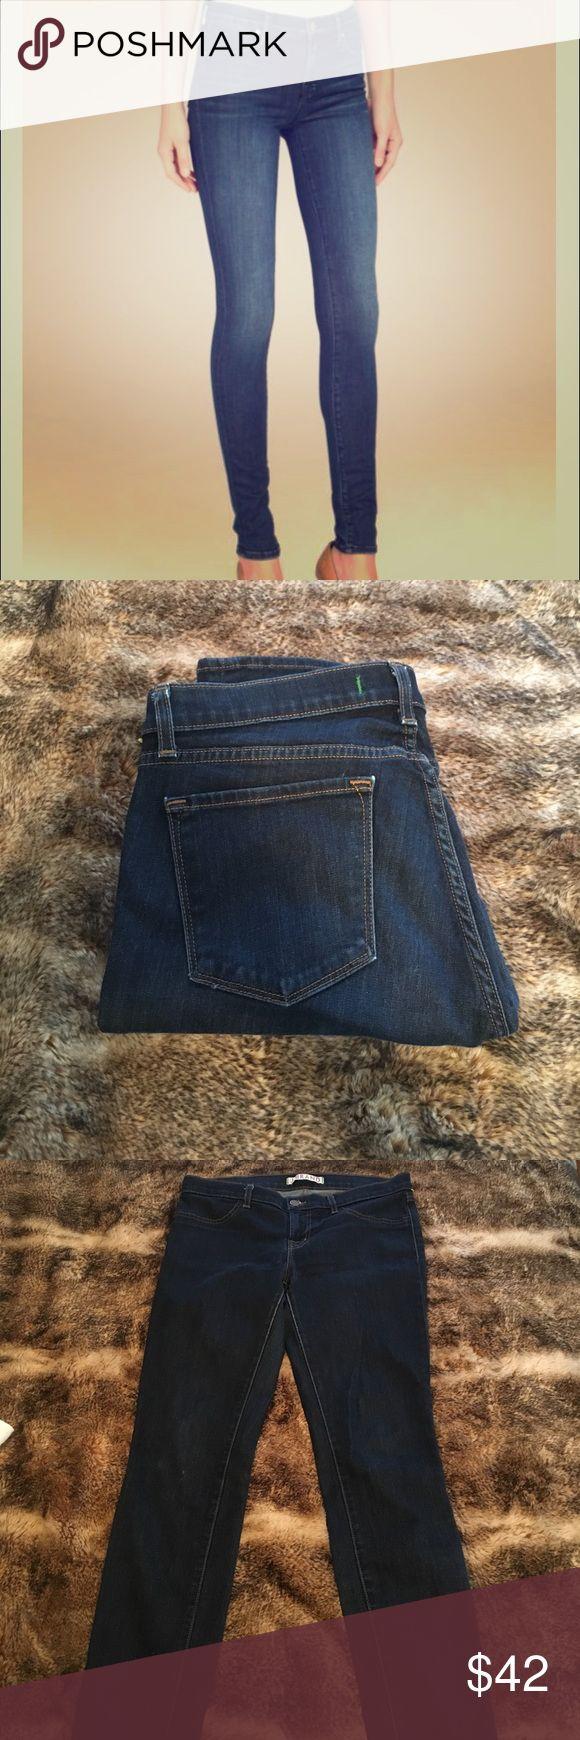 J Brand Super Skinny Starless Mid-Rise Jeans Practically new J Brand Super Skinny Starless Mid-Rise Jeans. Size 30 J Brand Jeans Skinny